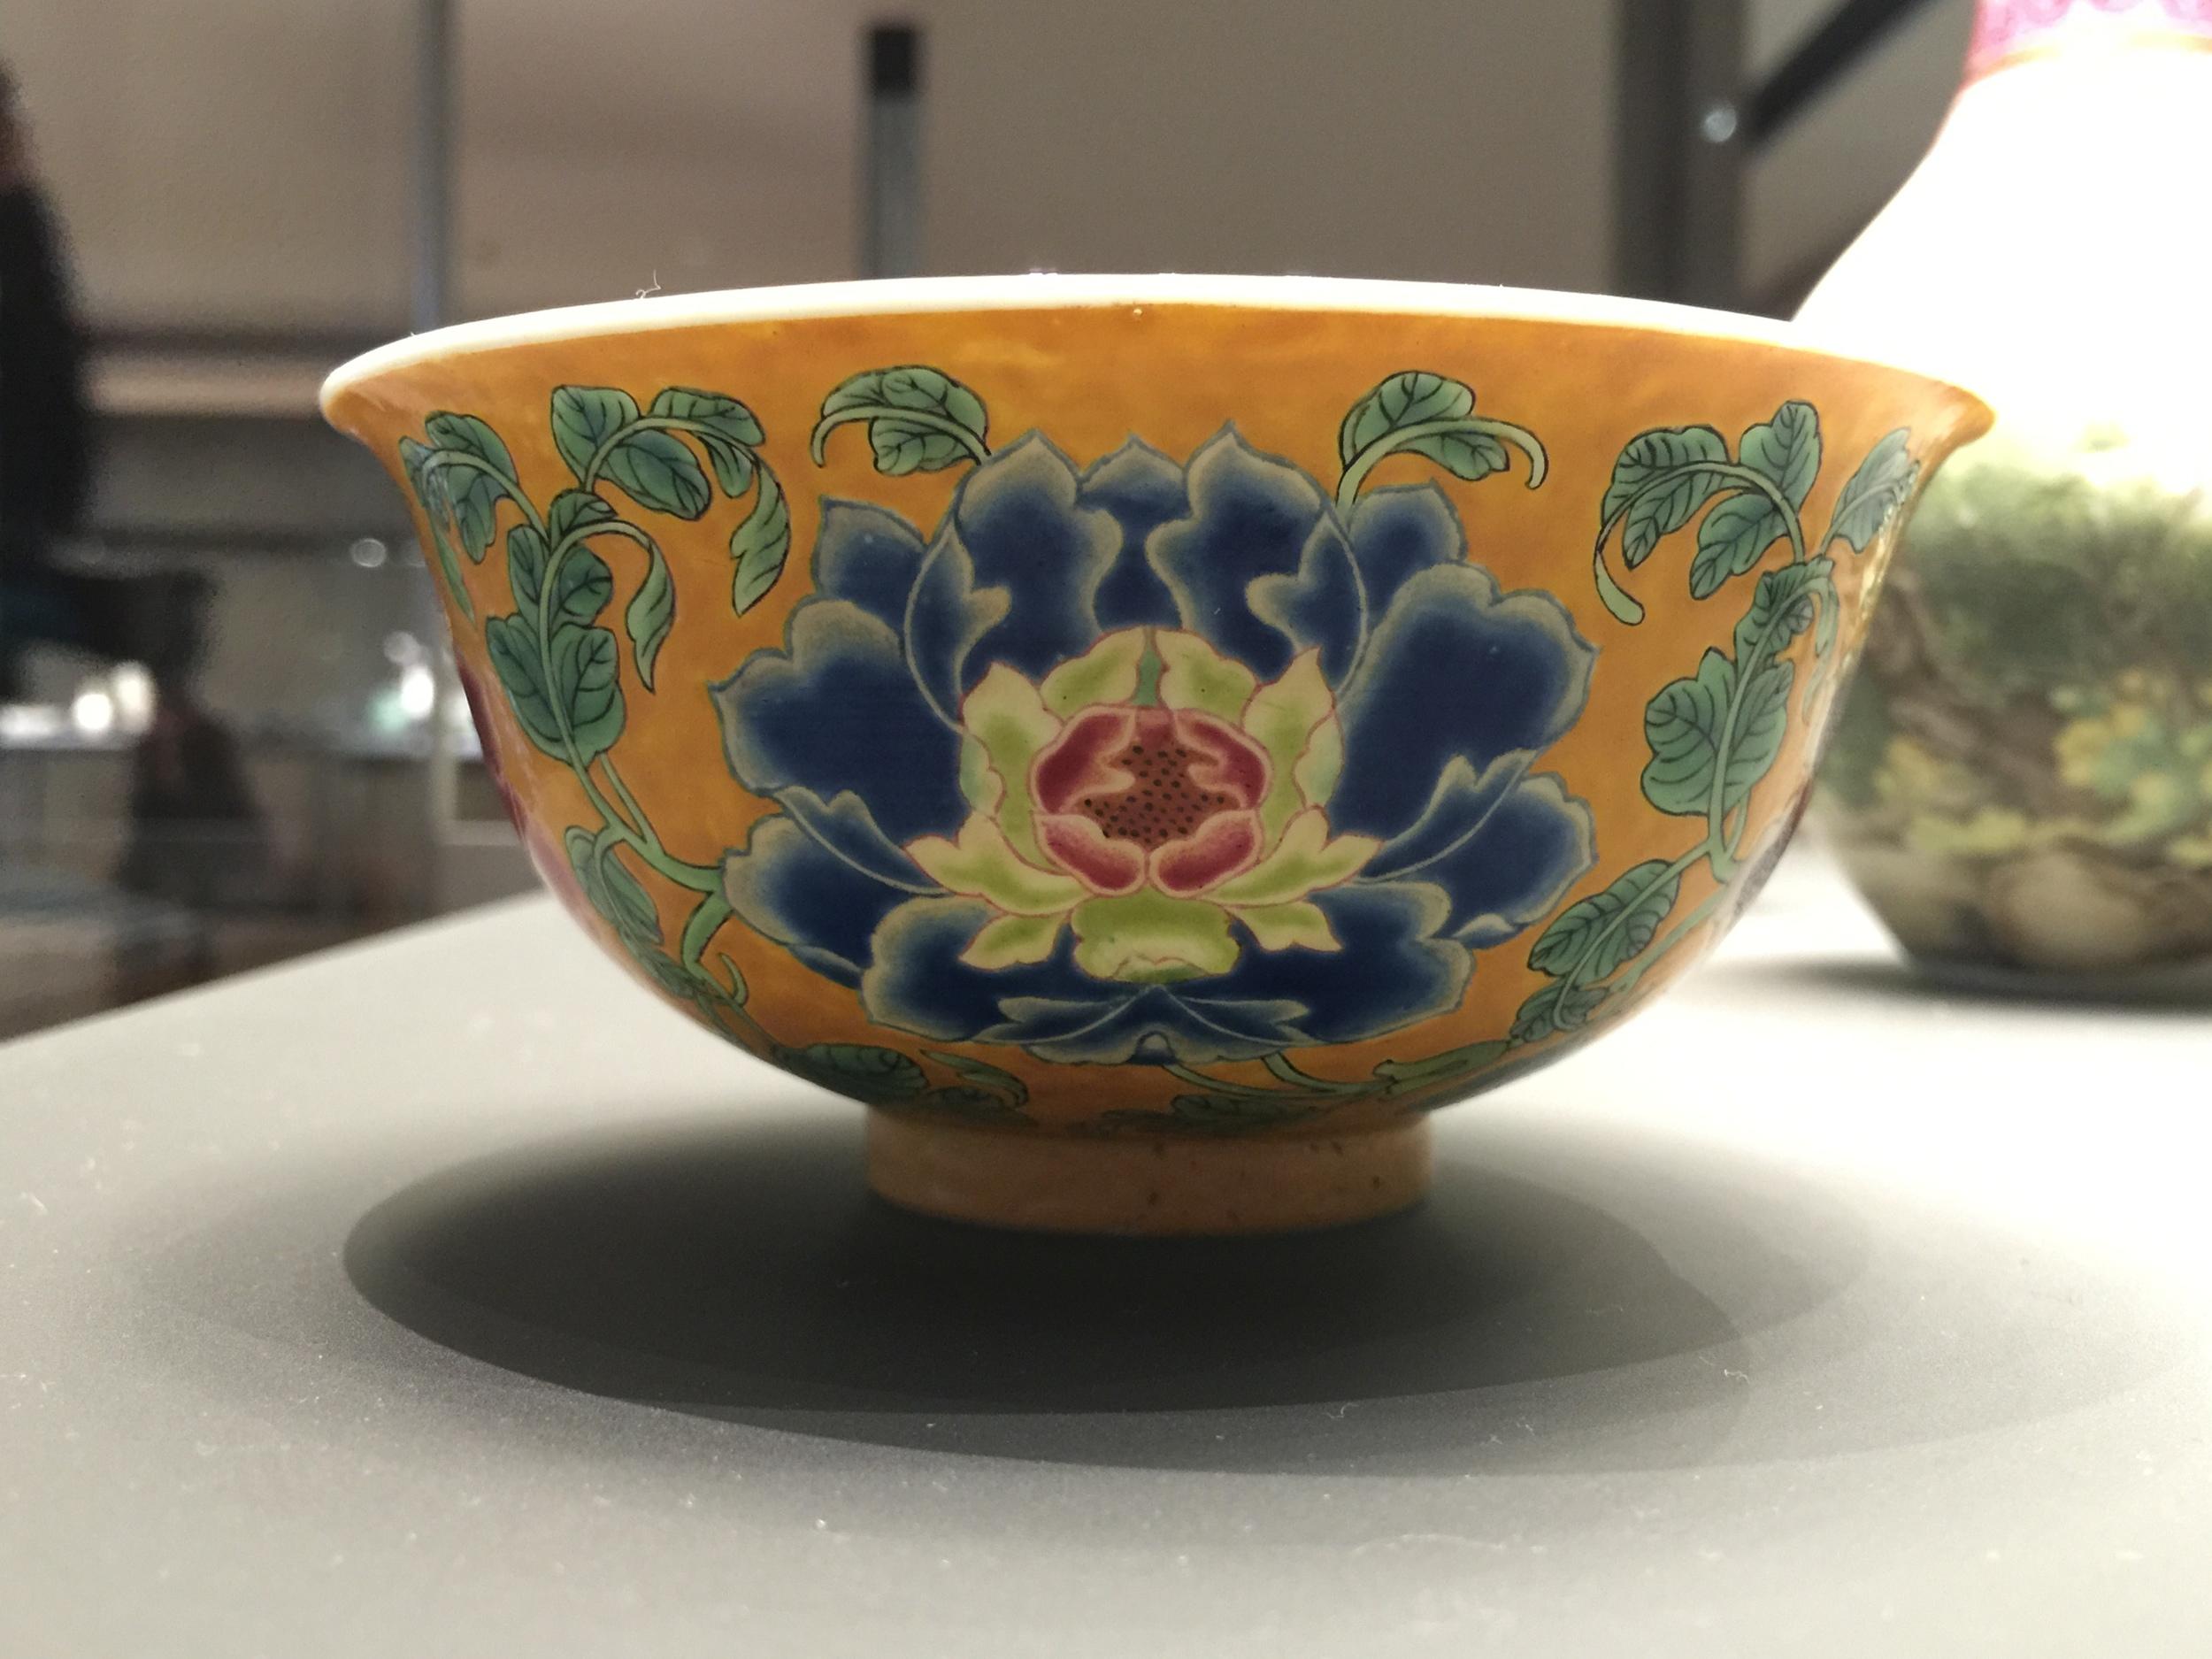 Chinese-Porcelain-British-Museum-Percival-David-jessewaugh.com-138.jpg